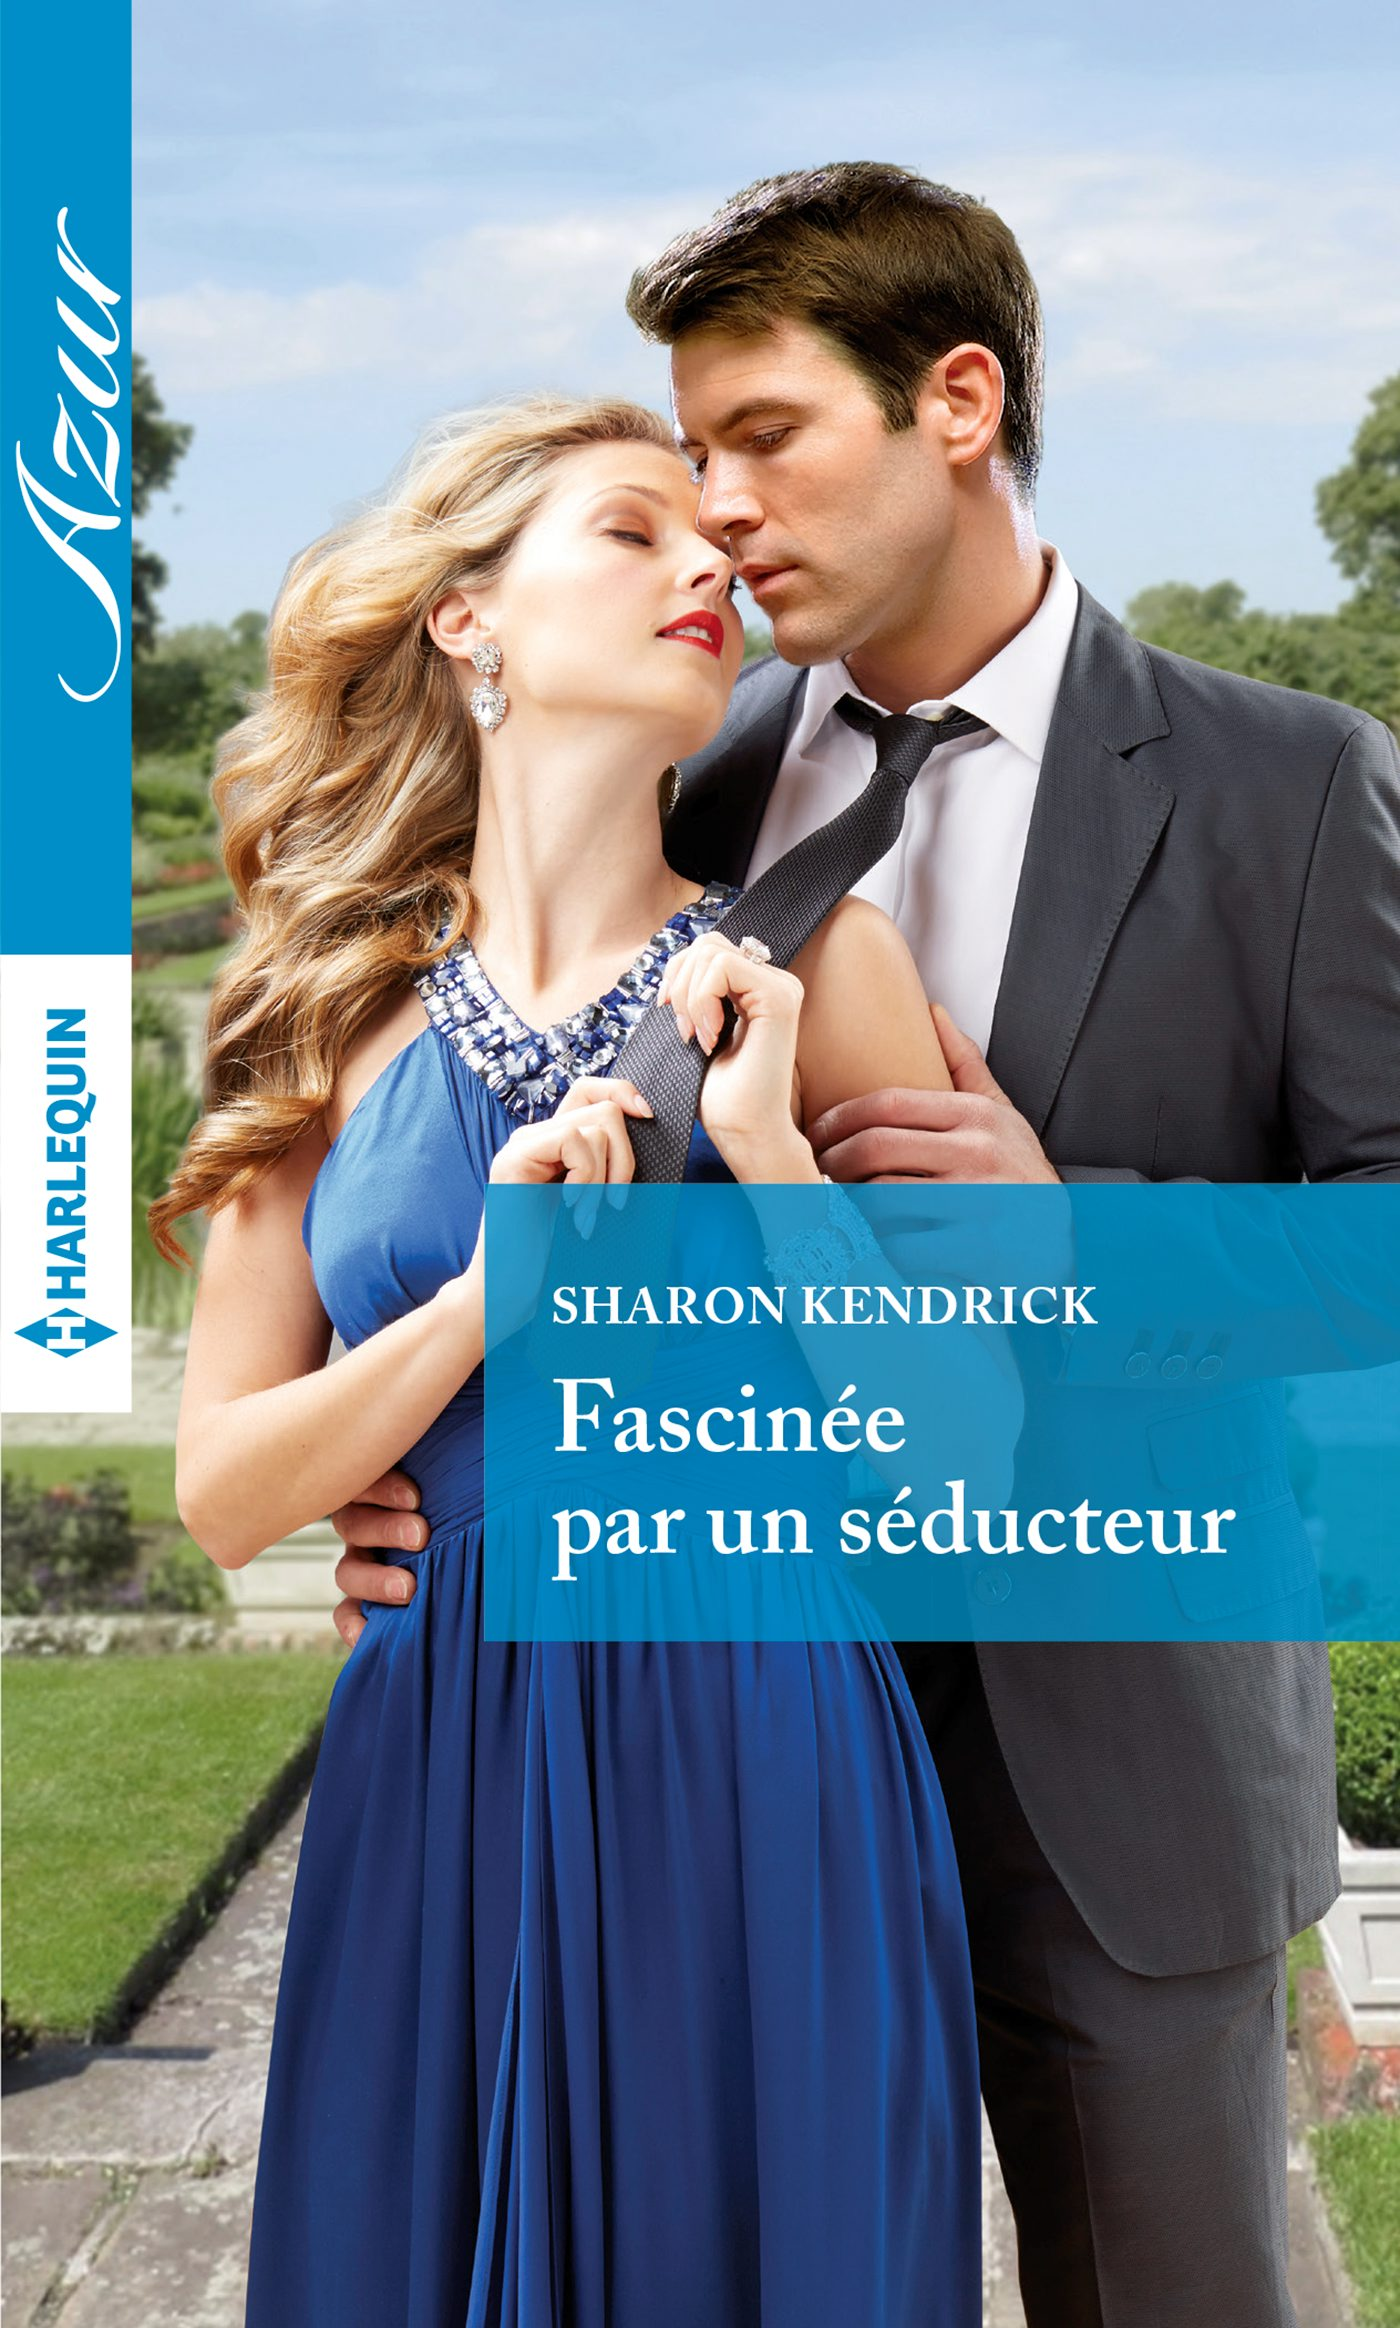 www.harlequin.fr/images/Livre-Hachette/HD/9782280354332.jpg